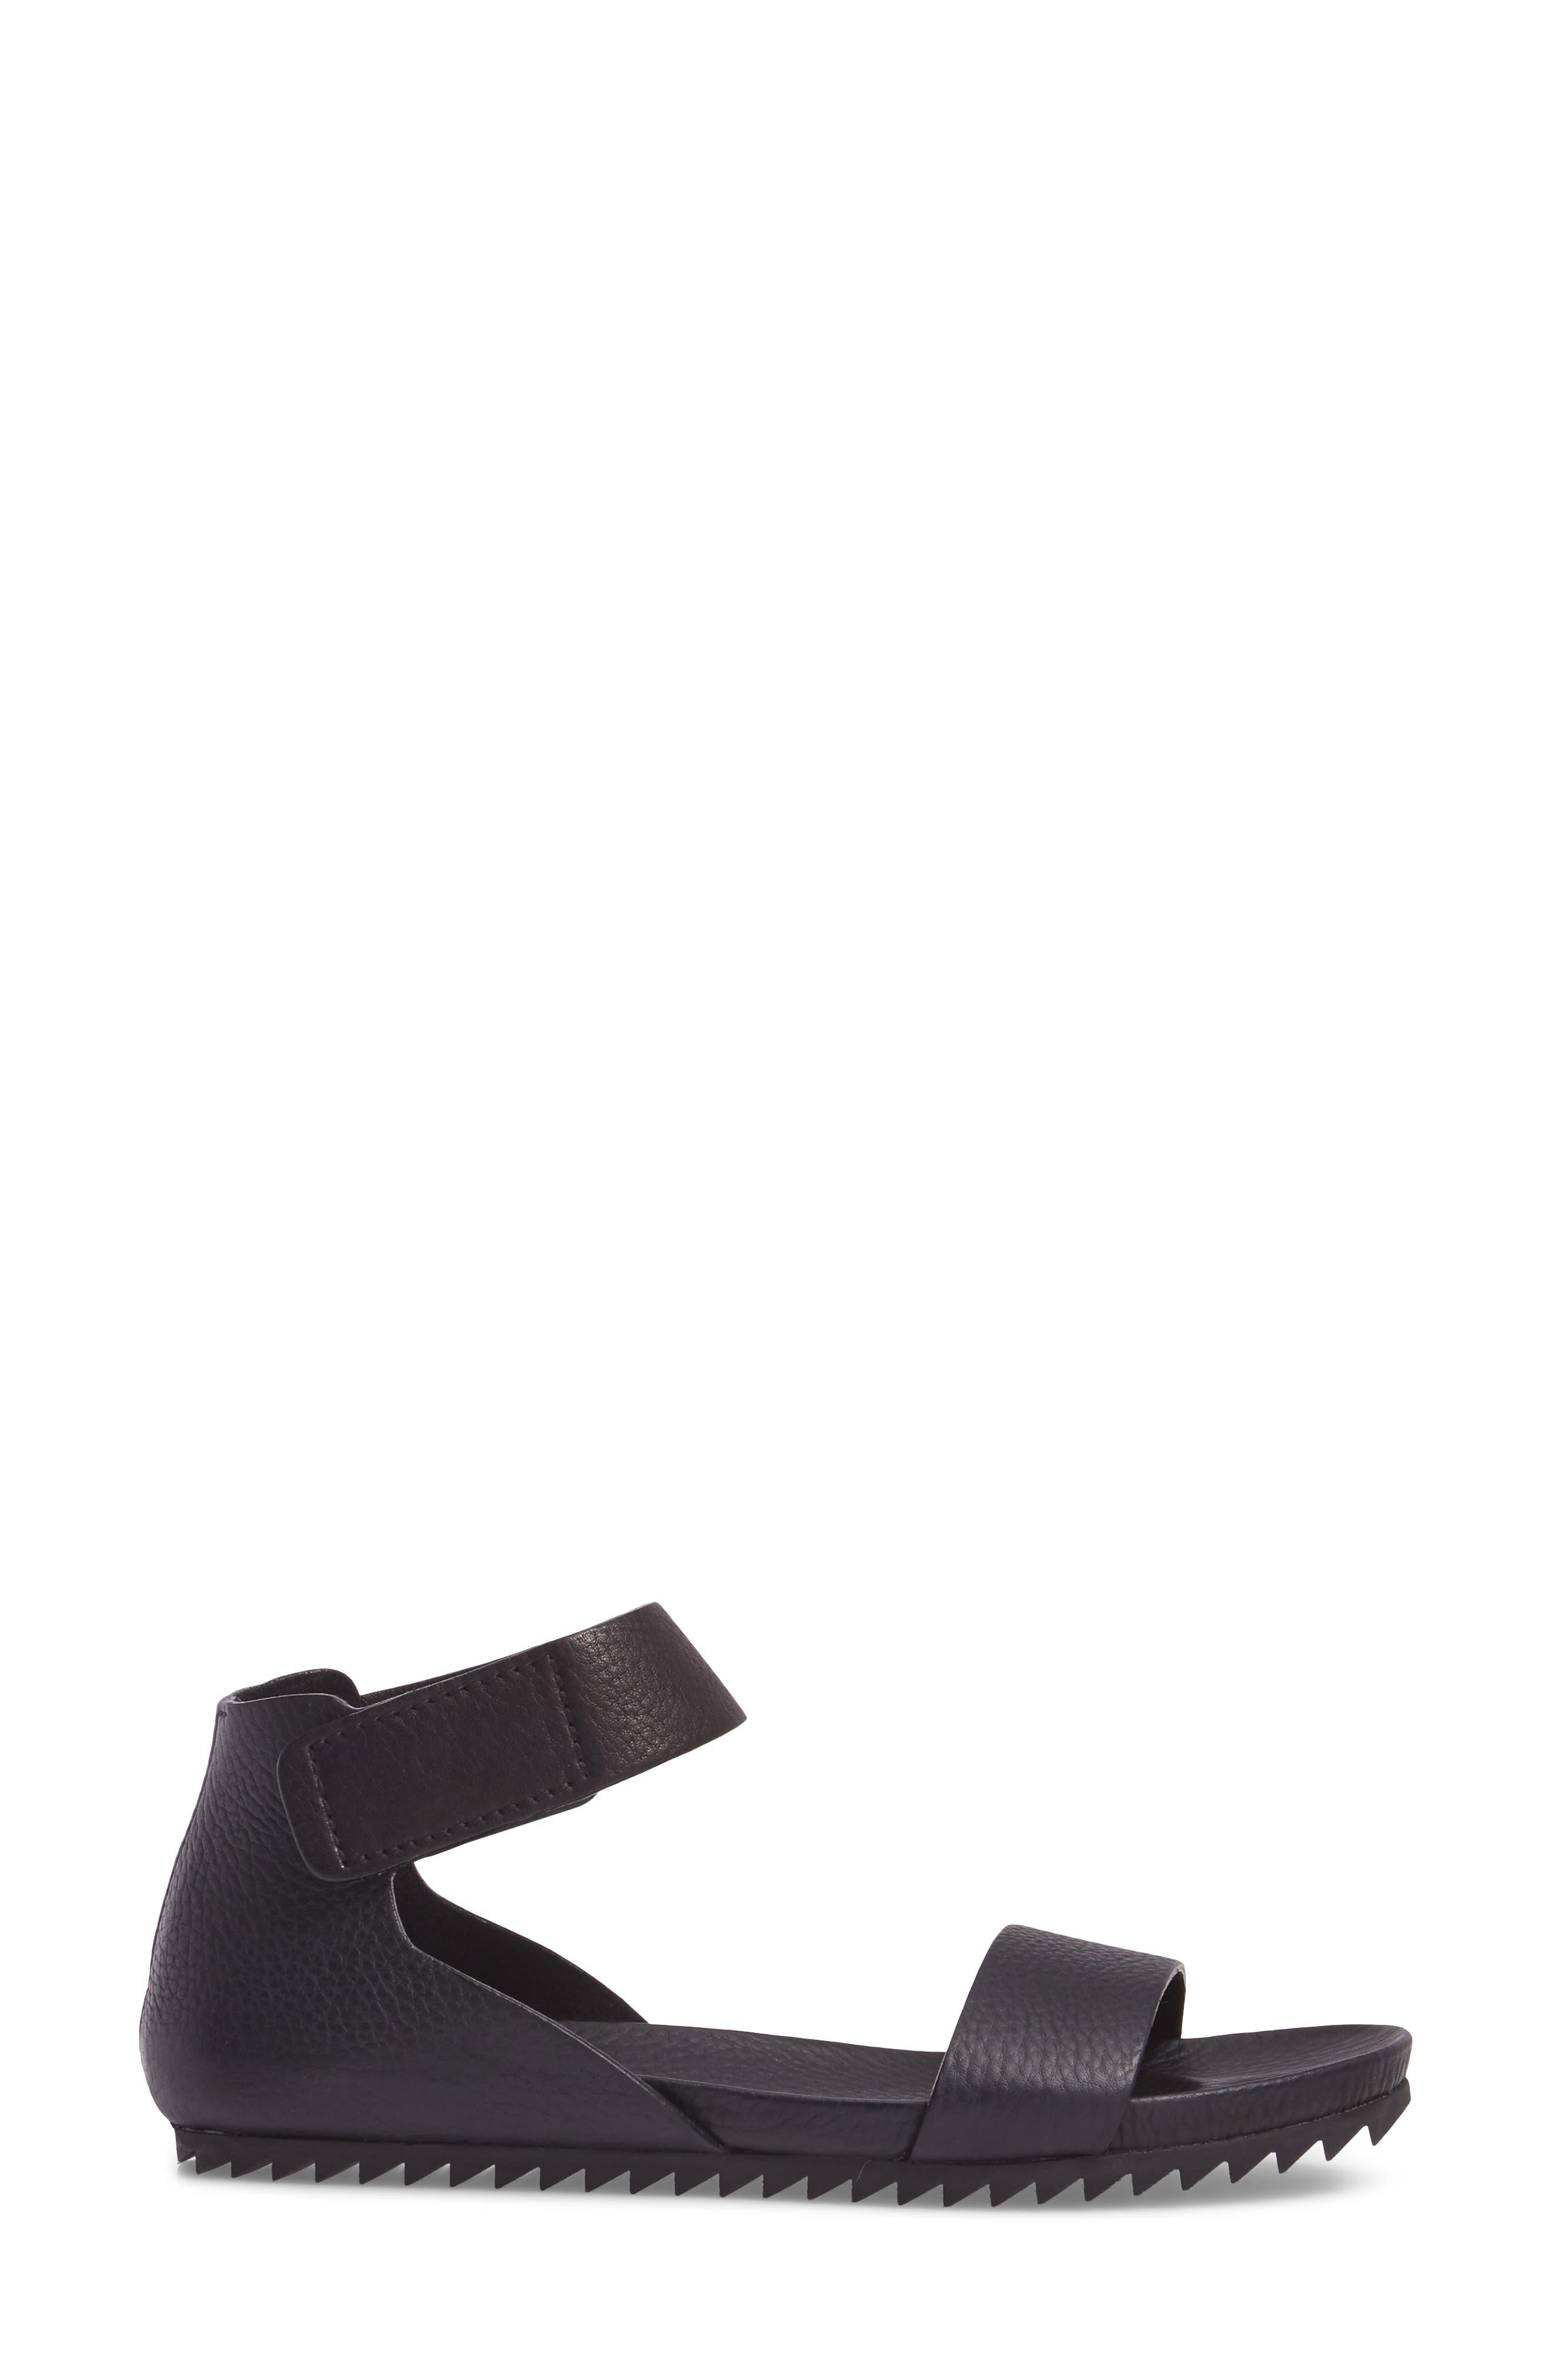 Alternate Image 3  - Pedro Garcia Jalila Ankle Strap Sandal (Women) (Nordstrom Exclusive)